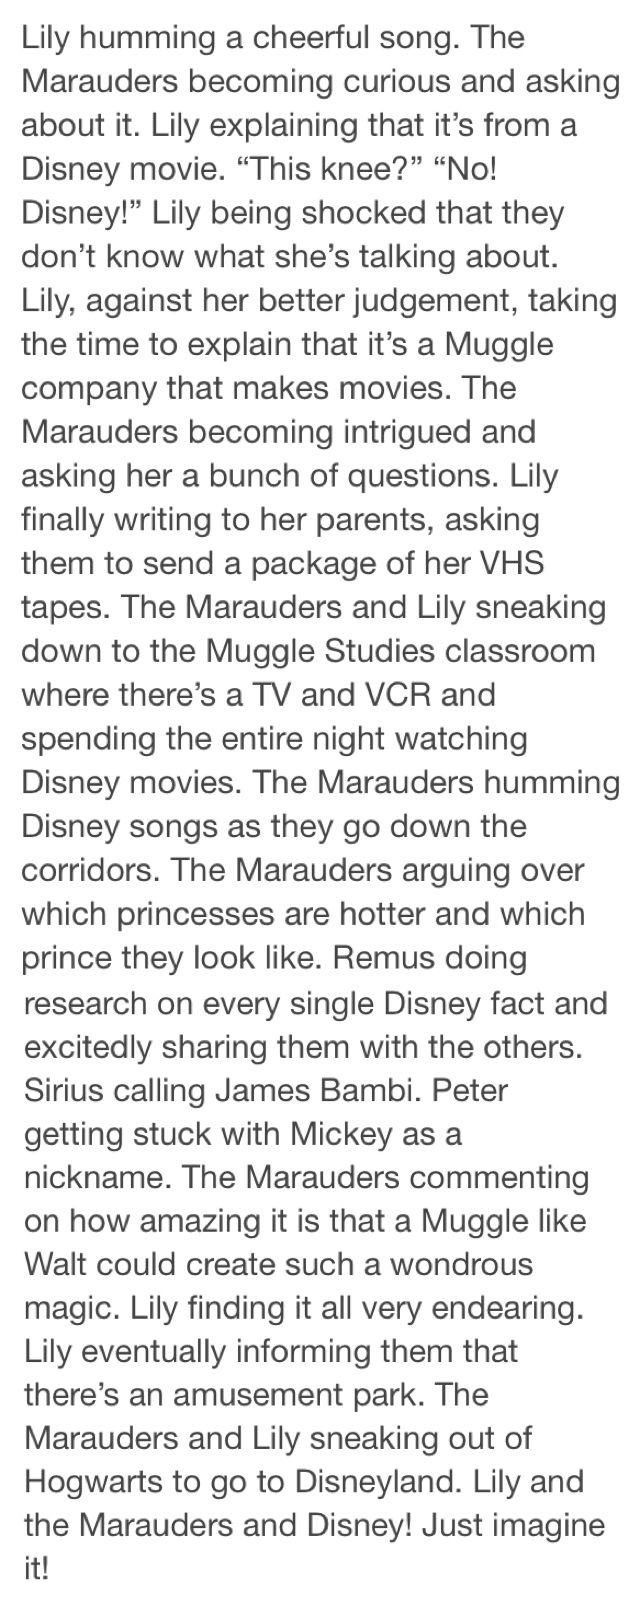 Disney Marauders Headcanon